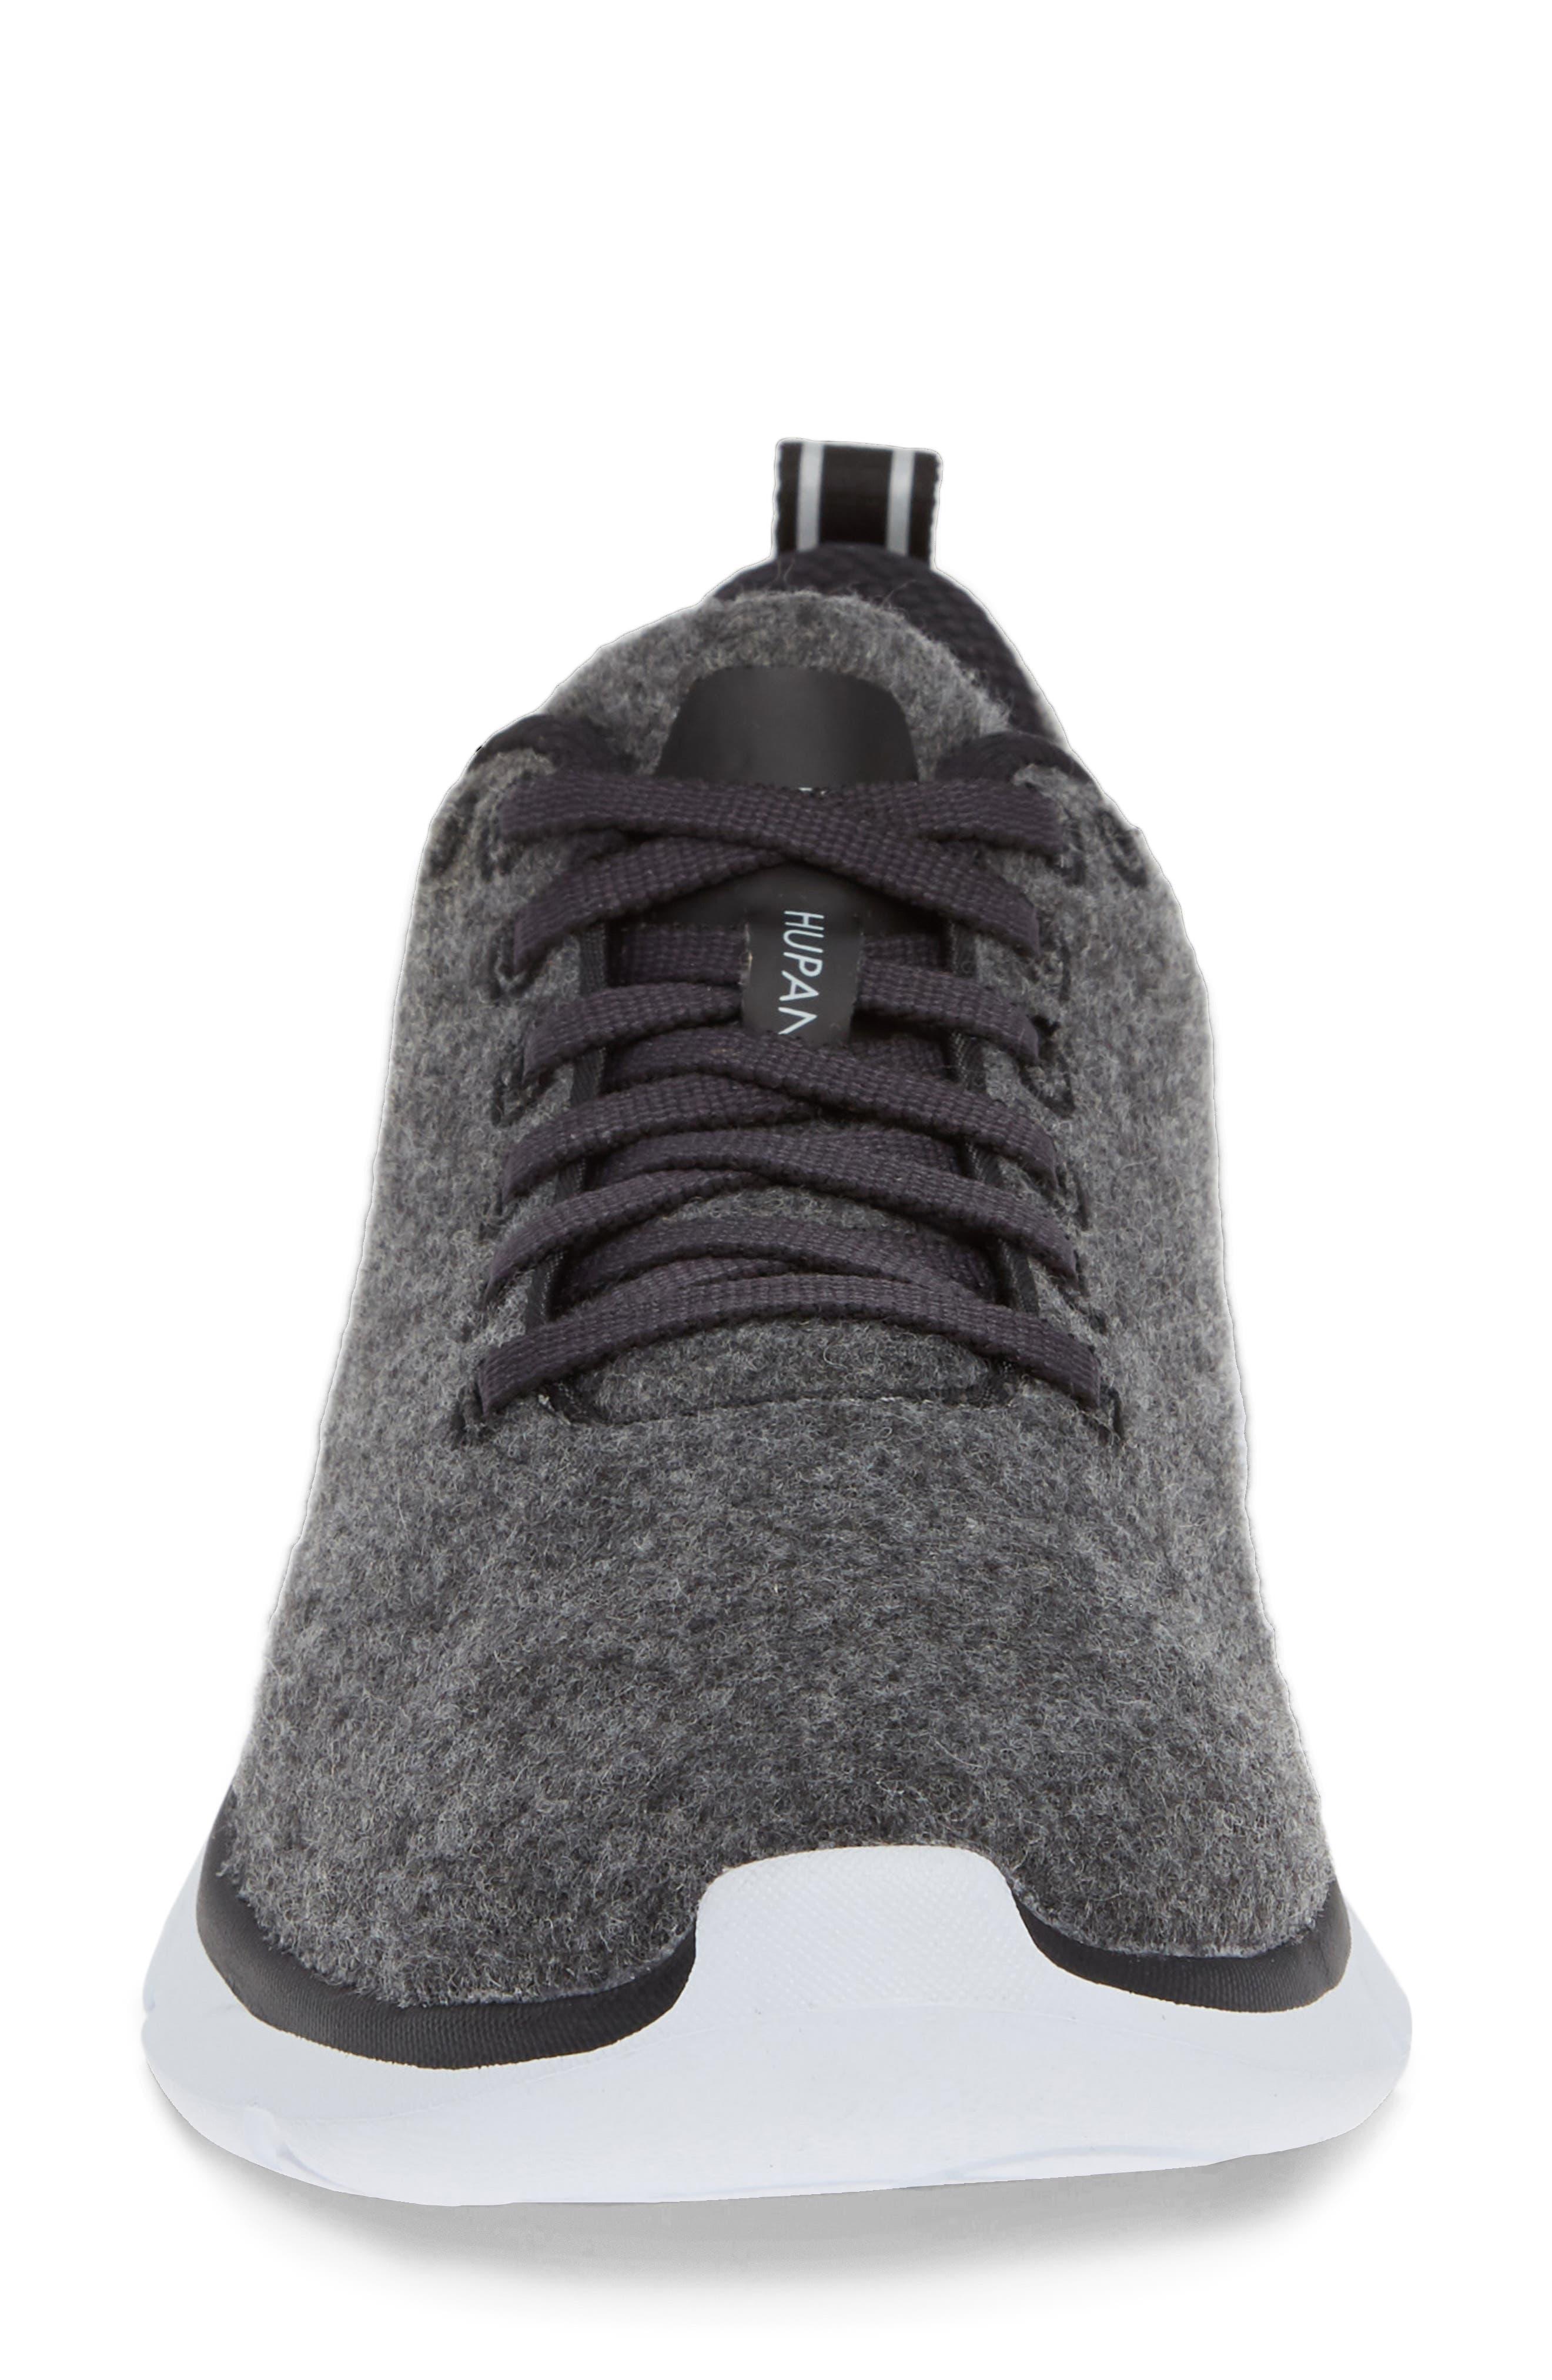 HOKA ONE ONE,                              Hupana Wool Sneaker,                             Alternate thumbnail 4, color,                             023